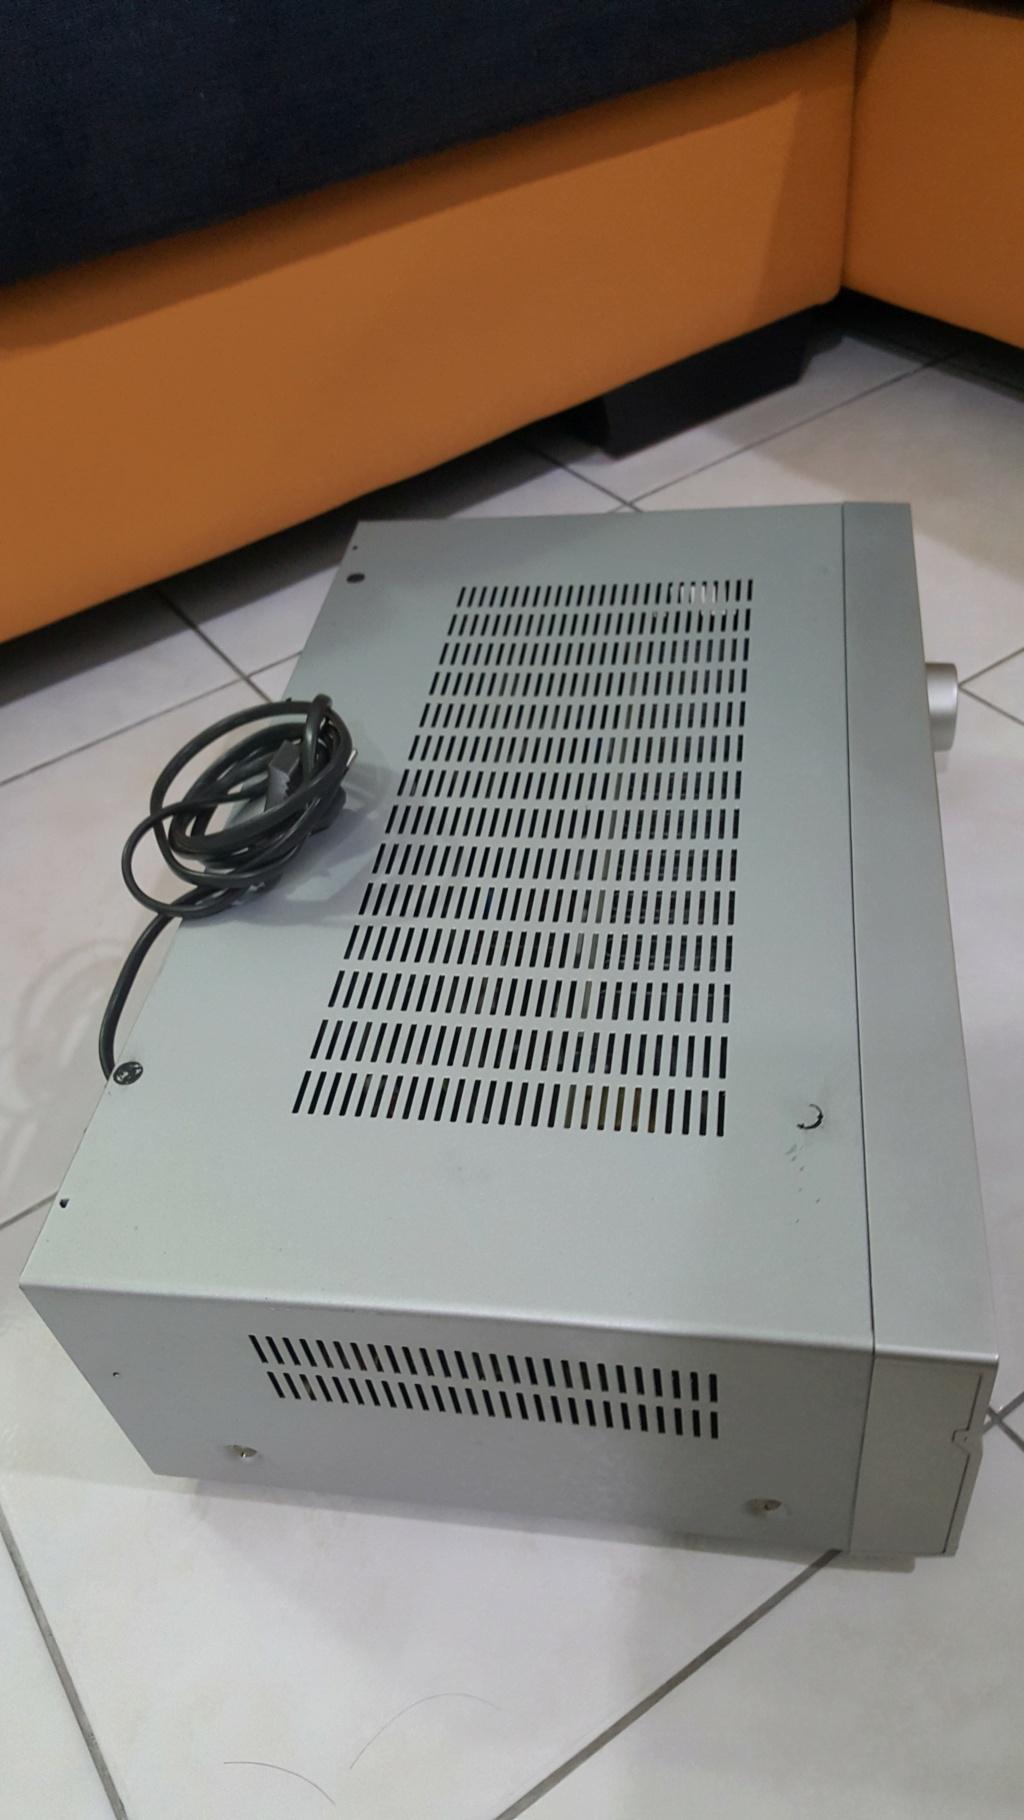 Sony 5.1 Avr amp. 20201113